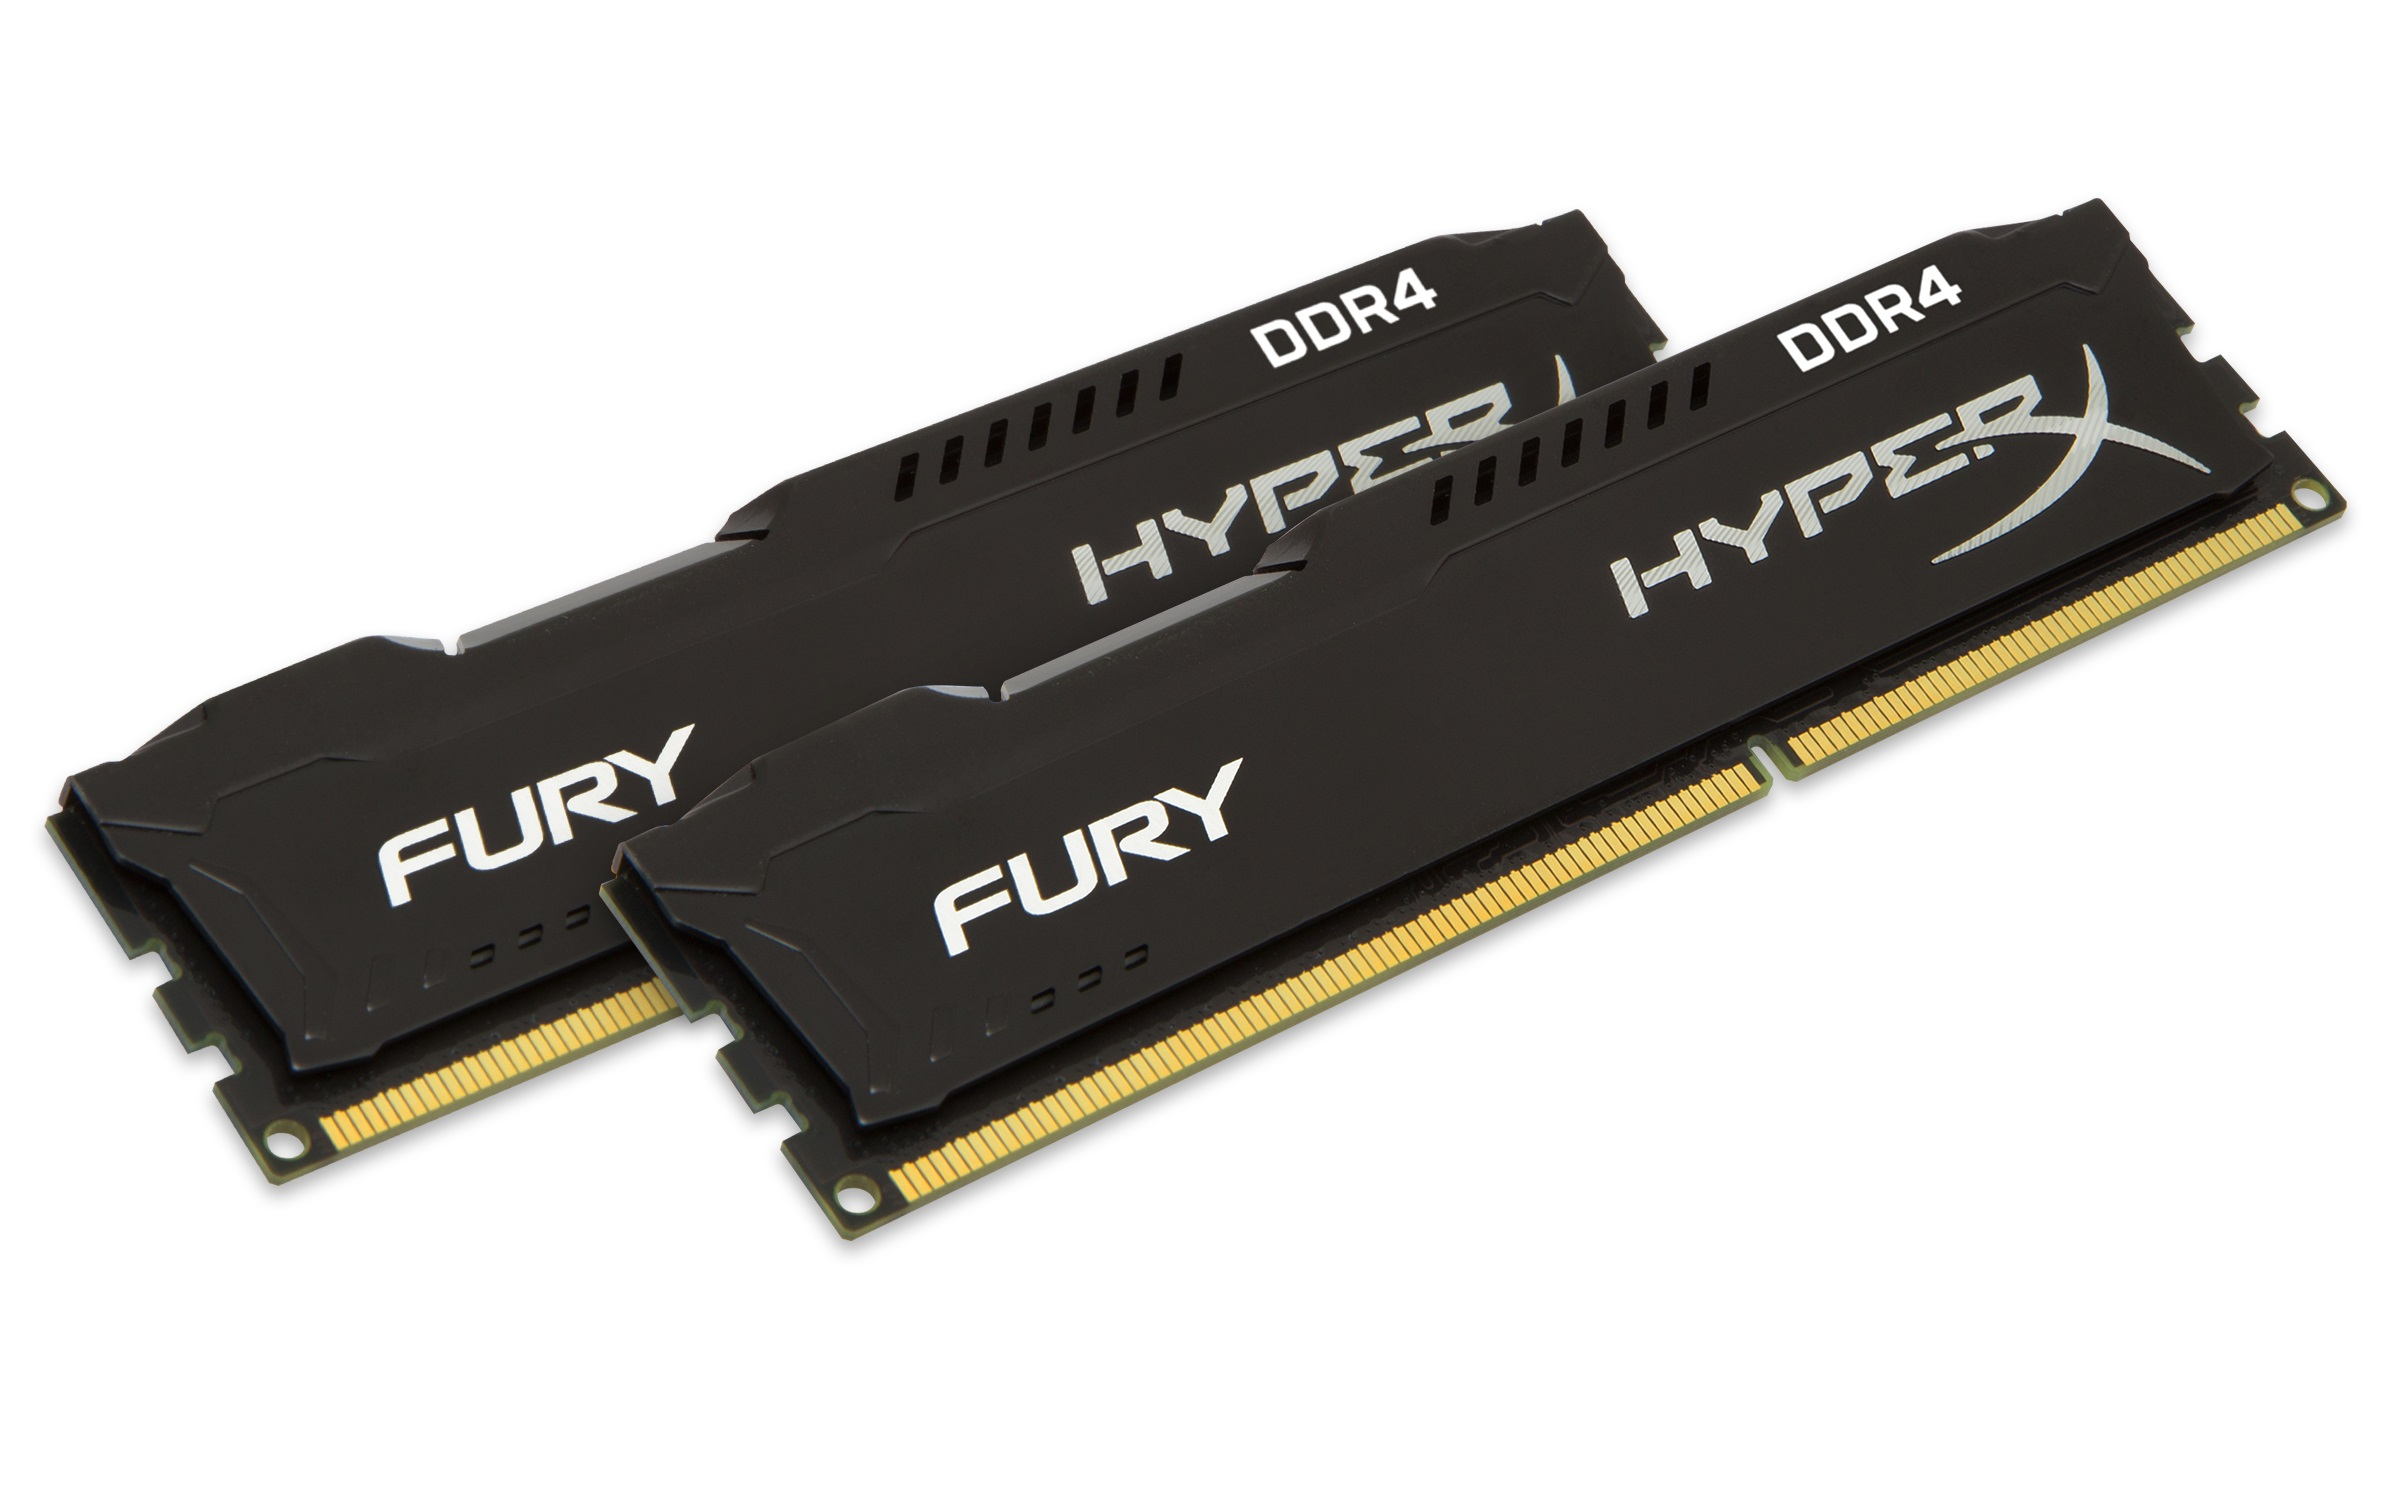 HyperX FURY Memory Black 8GB DDR4 2666MHz Kit 8GB DDR4 2666MHz memory module